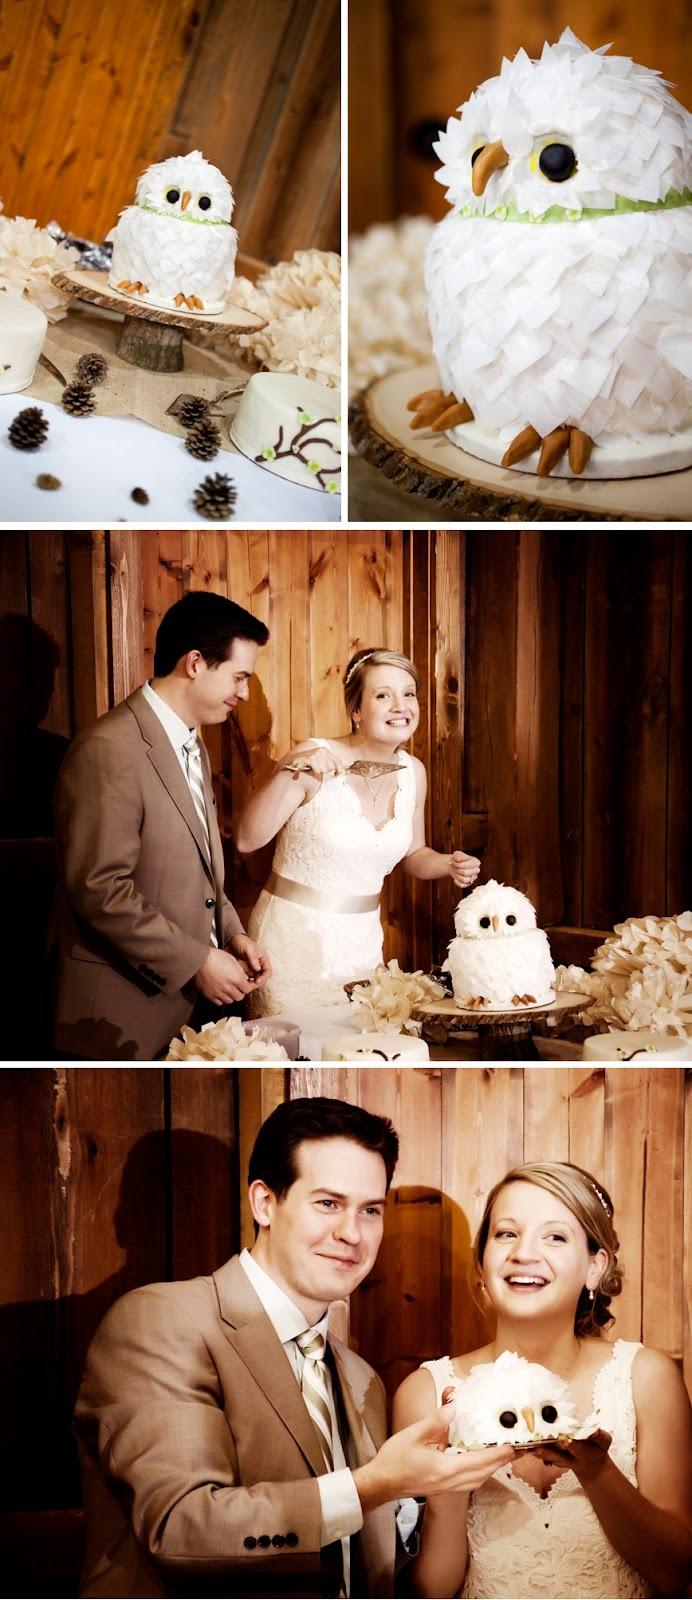 Cutest owl wedding cake ever!